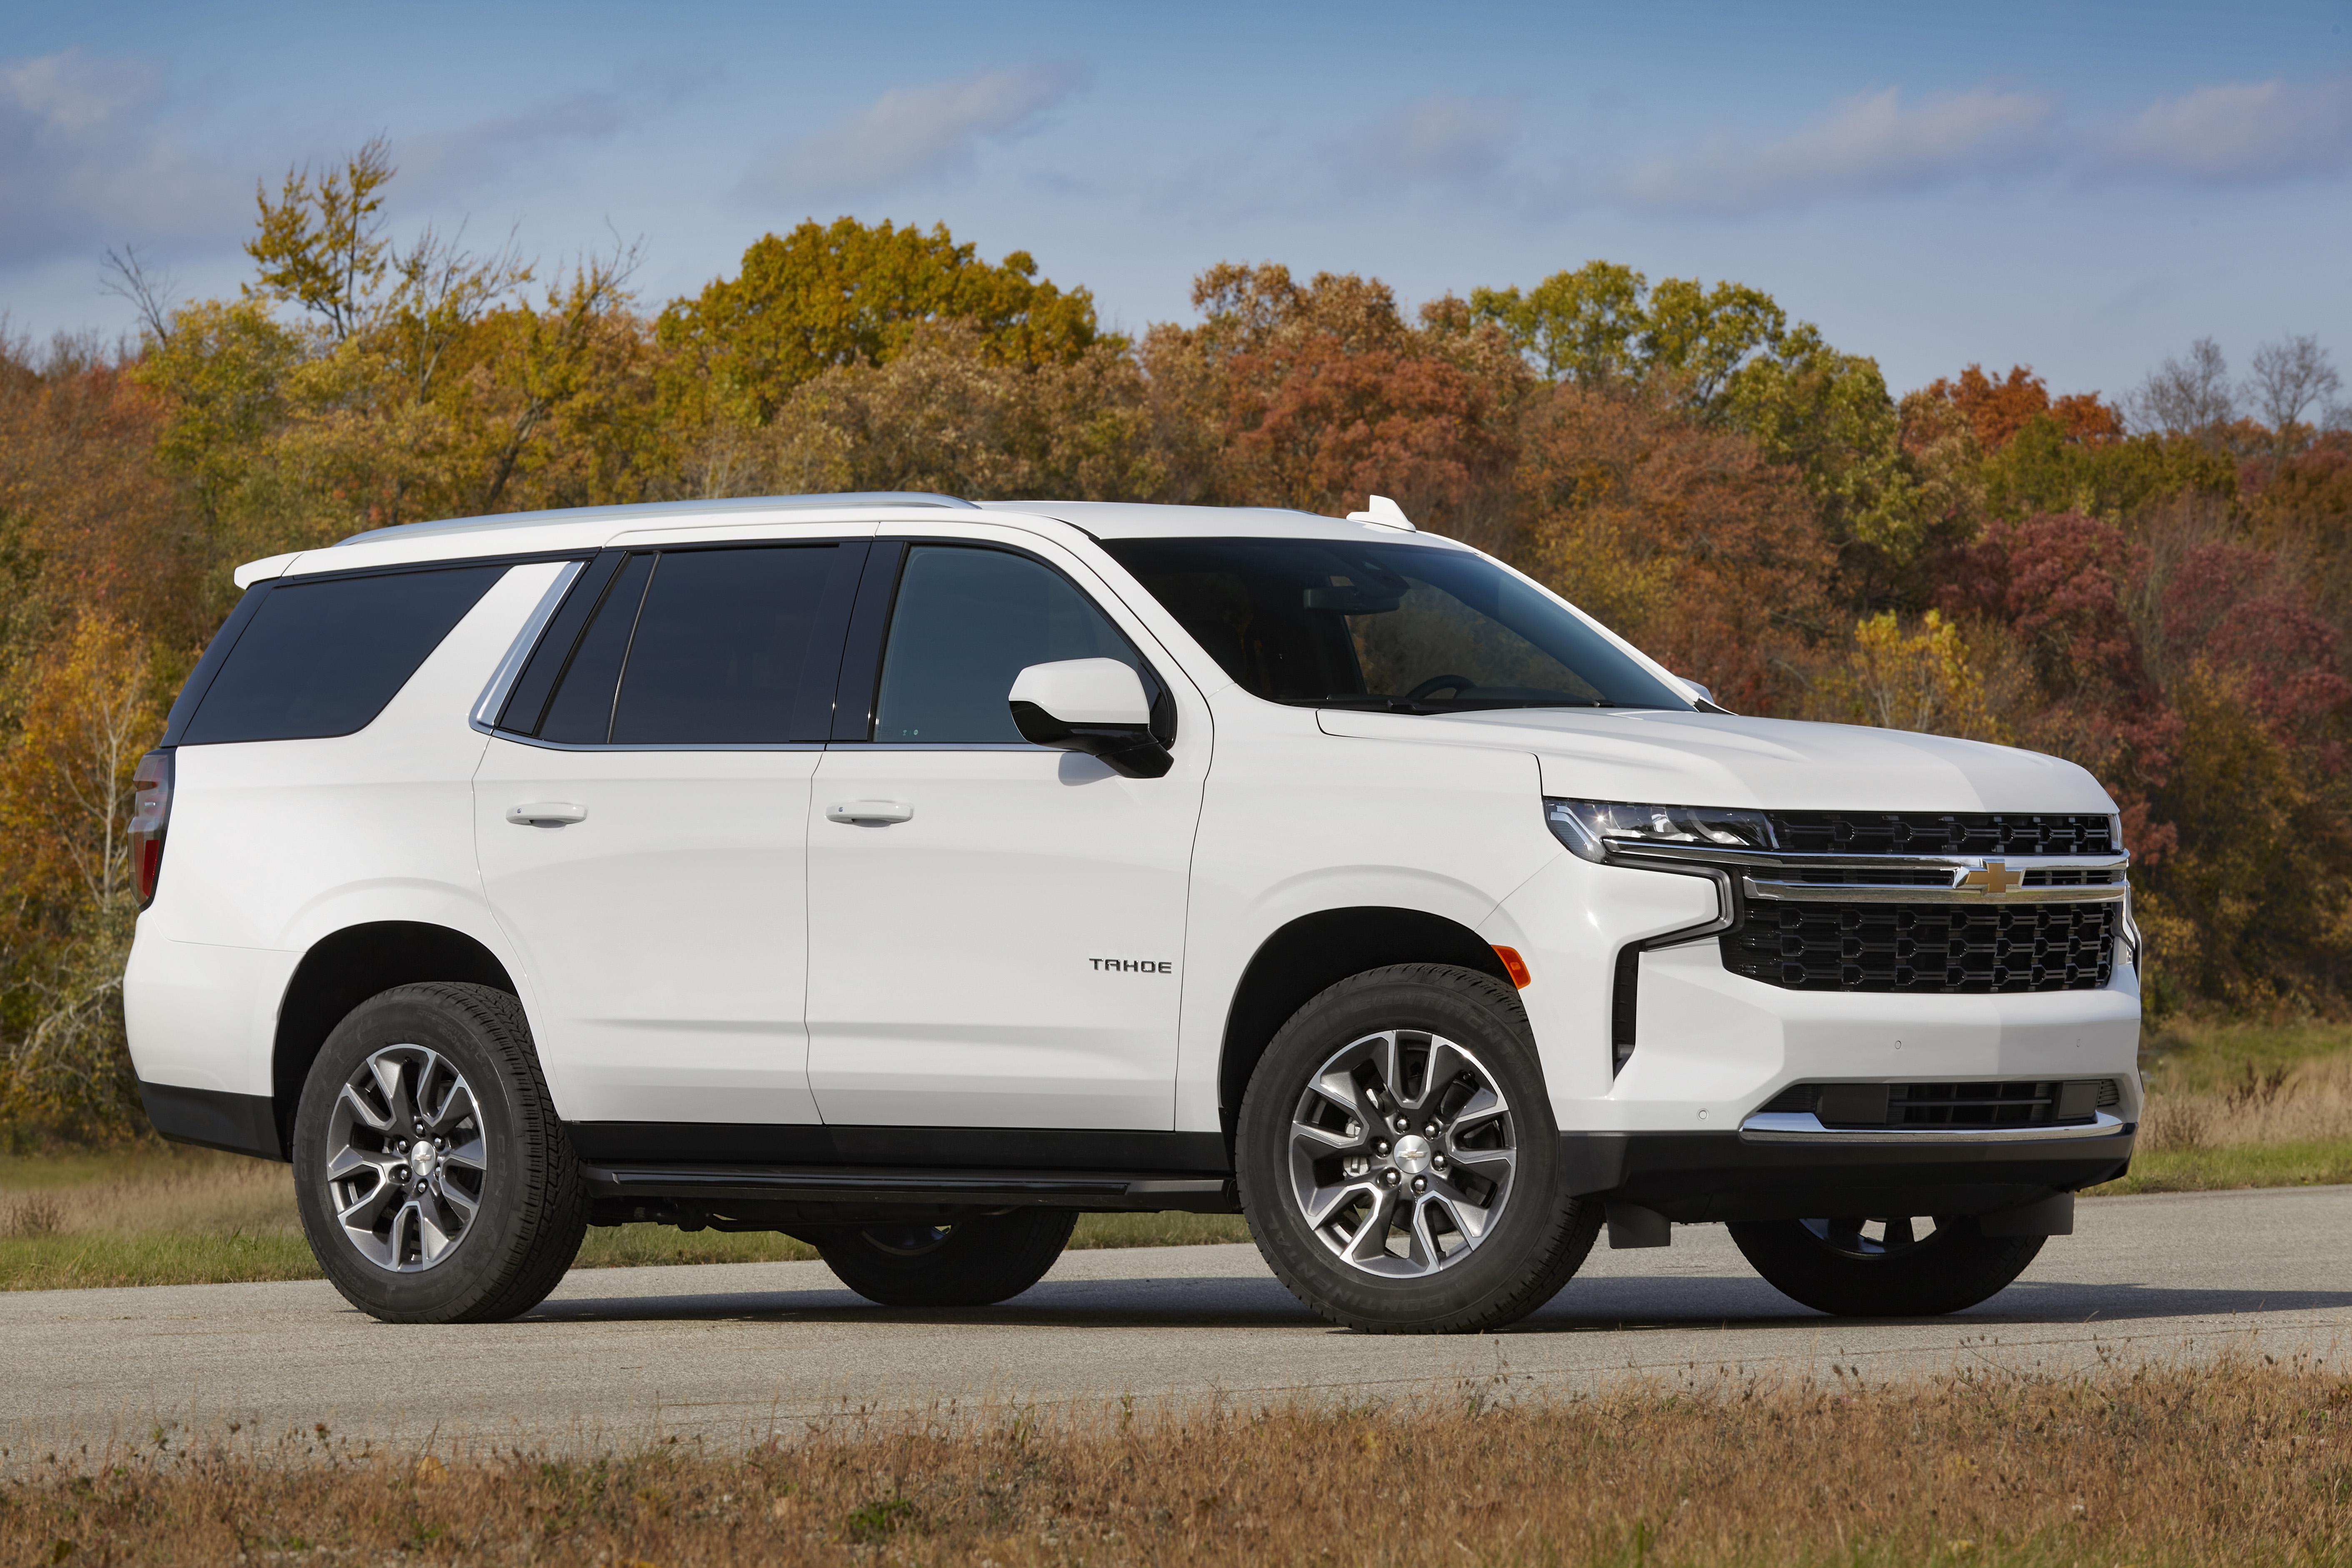 2021 Chevrolet Tahoe 3 0l Duramax Offers Class Leading Fuel Efficiency